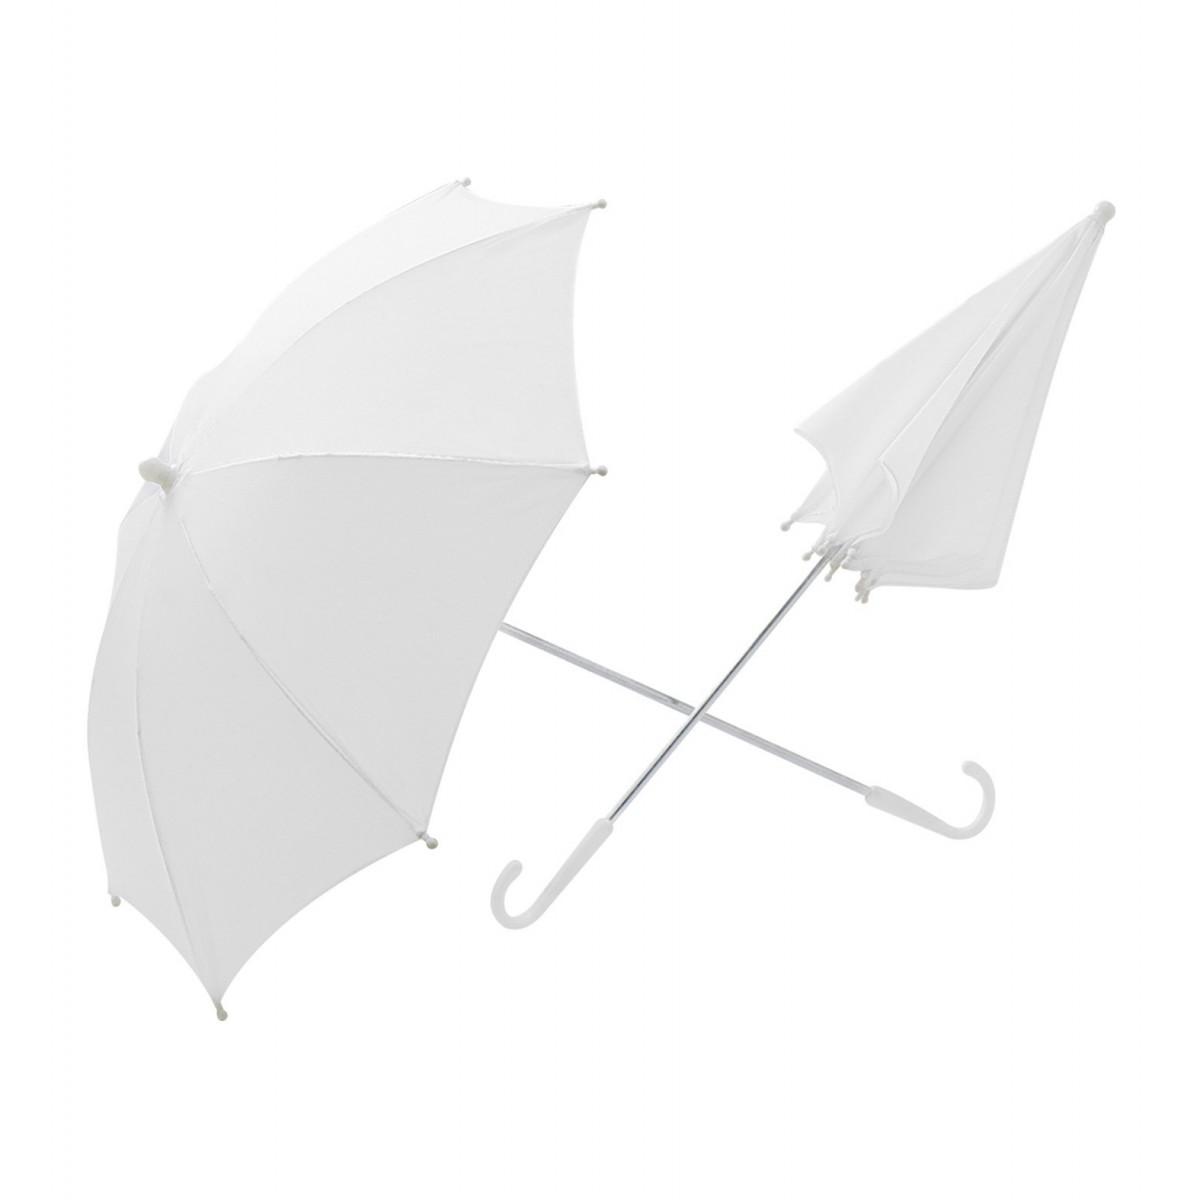 ombrello bianco diam. 60 cm